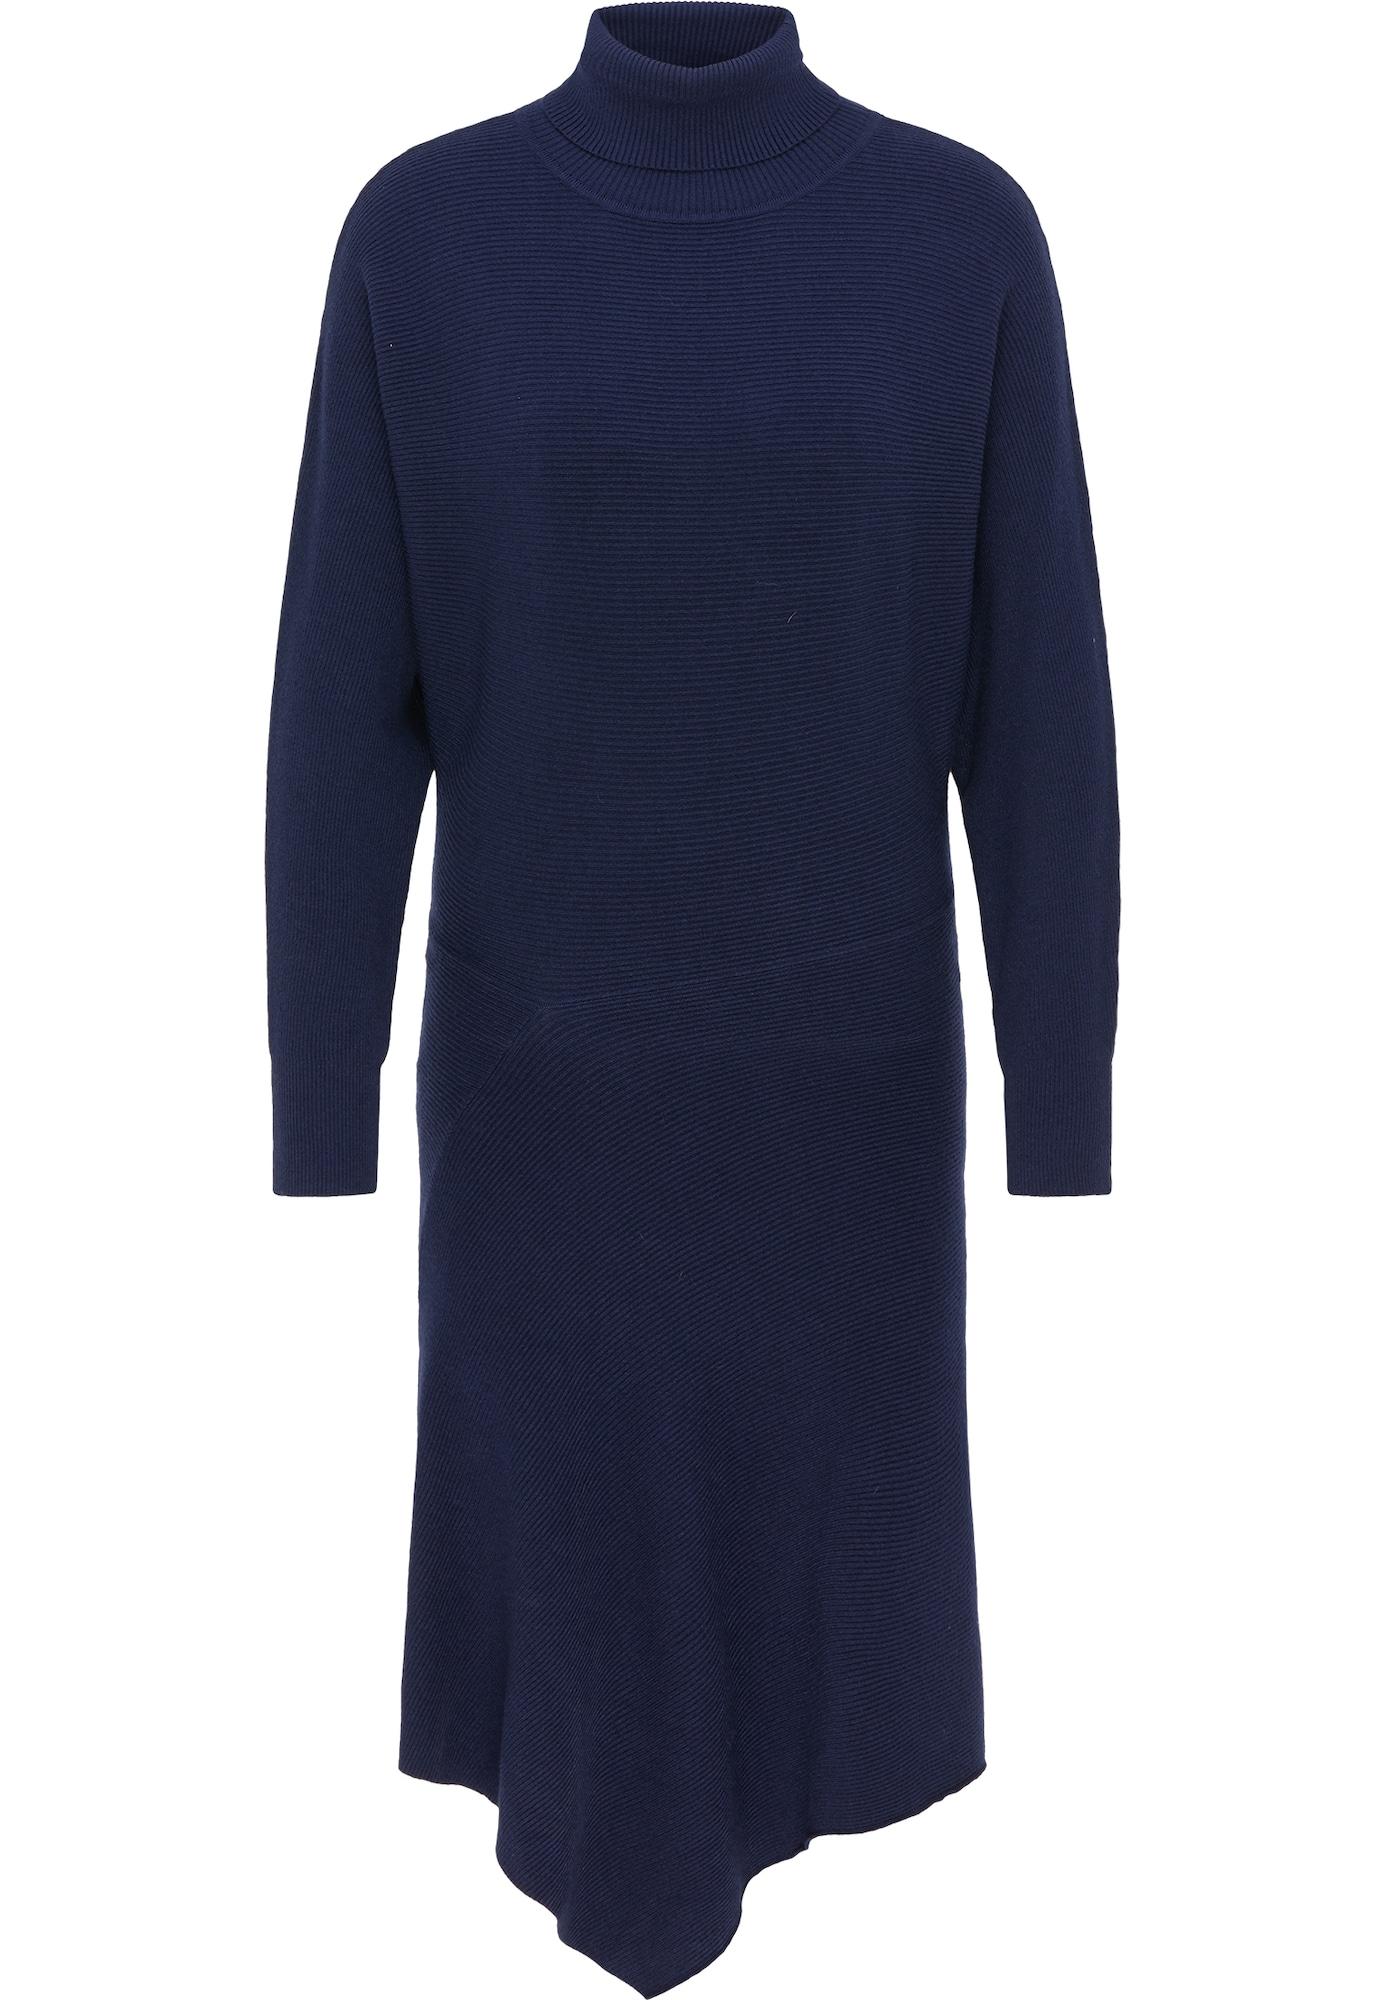 usha WHITE LABEL Megzta suknelė tamsiai mėlyna